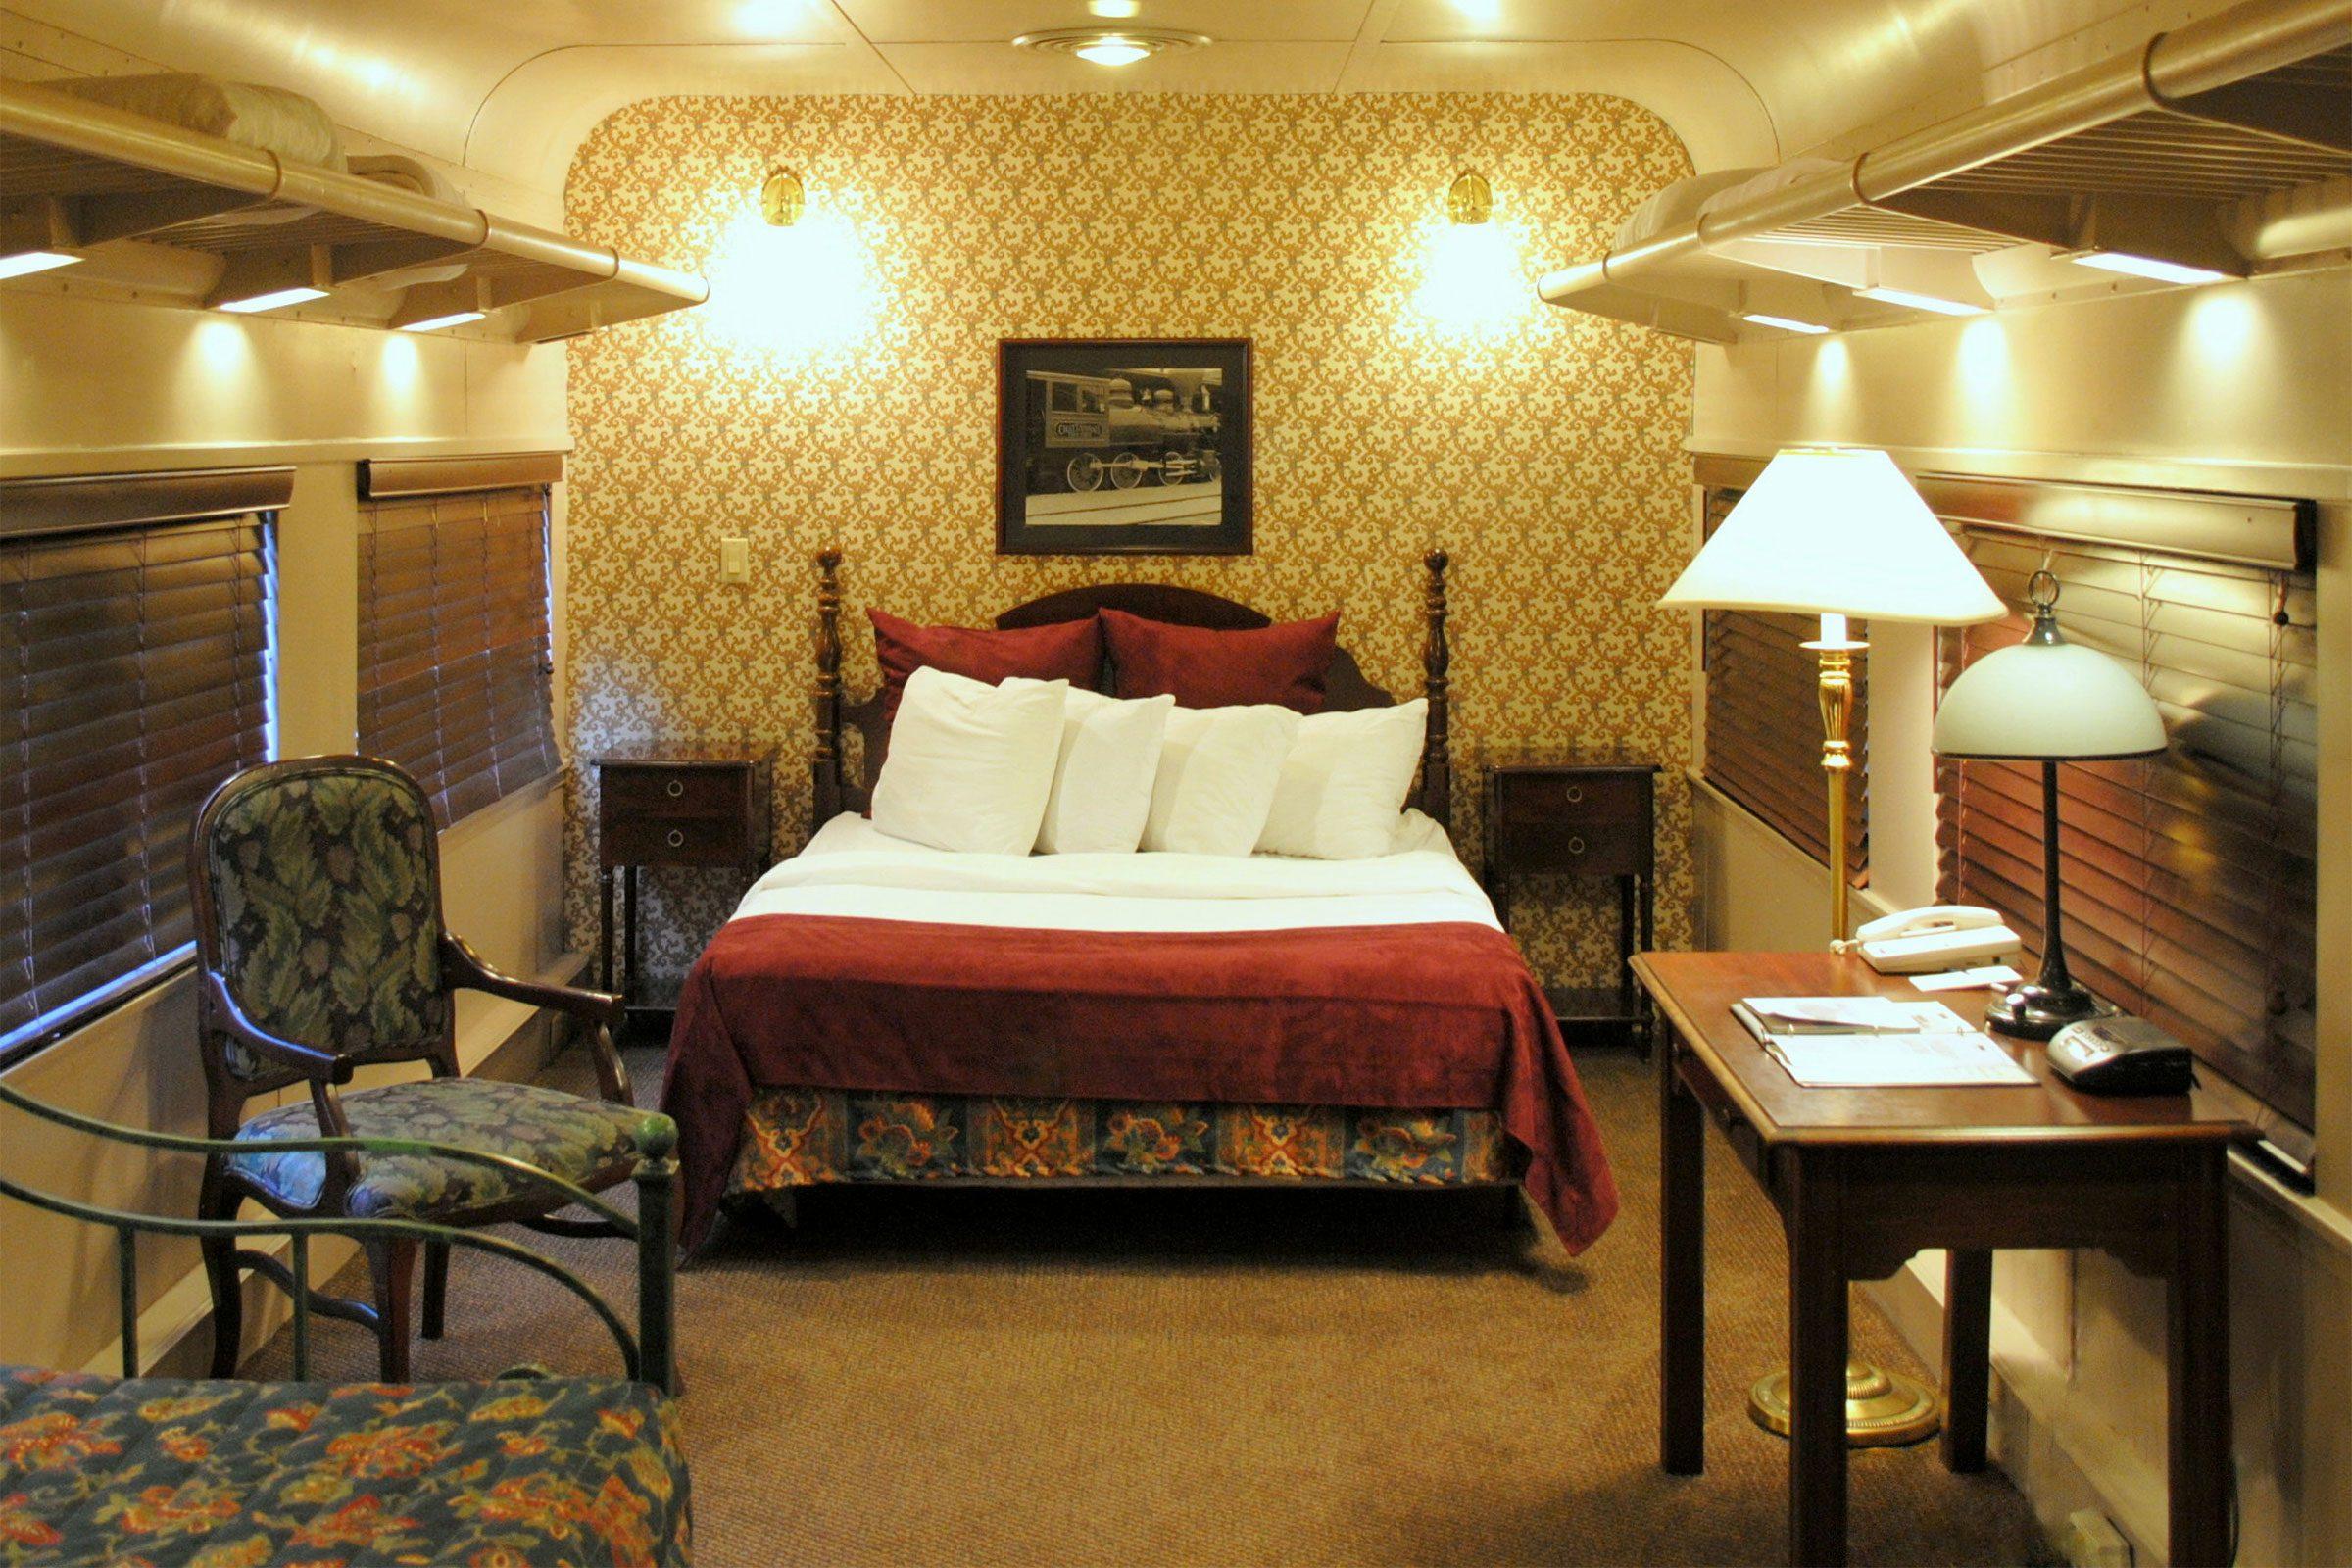 Unusual hotel rooms worth spending the night 64